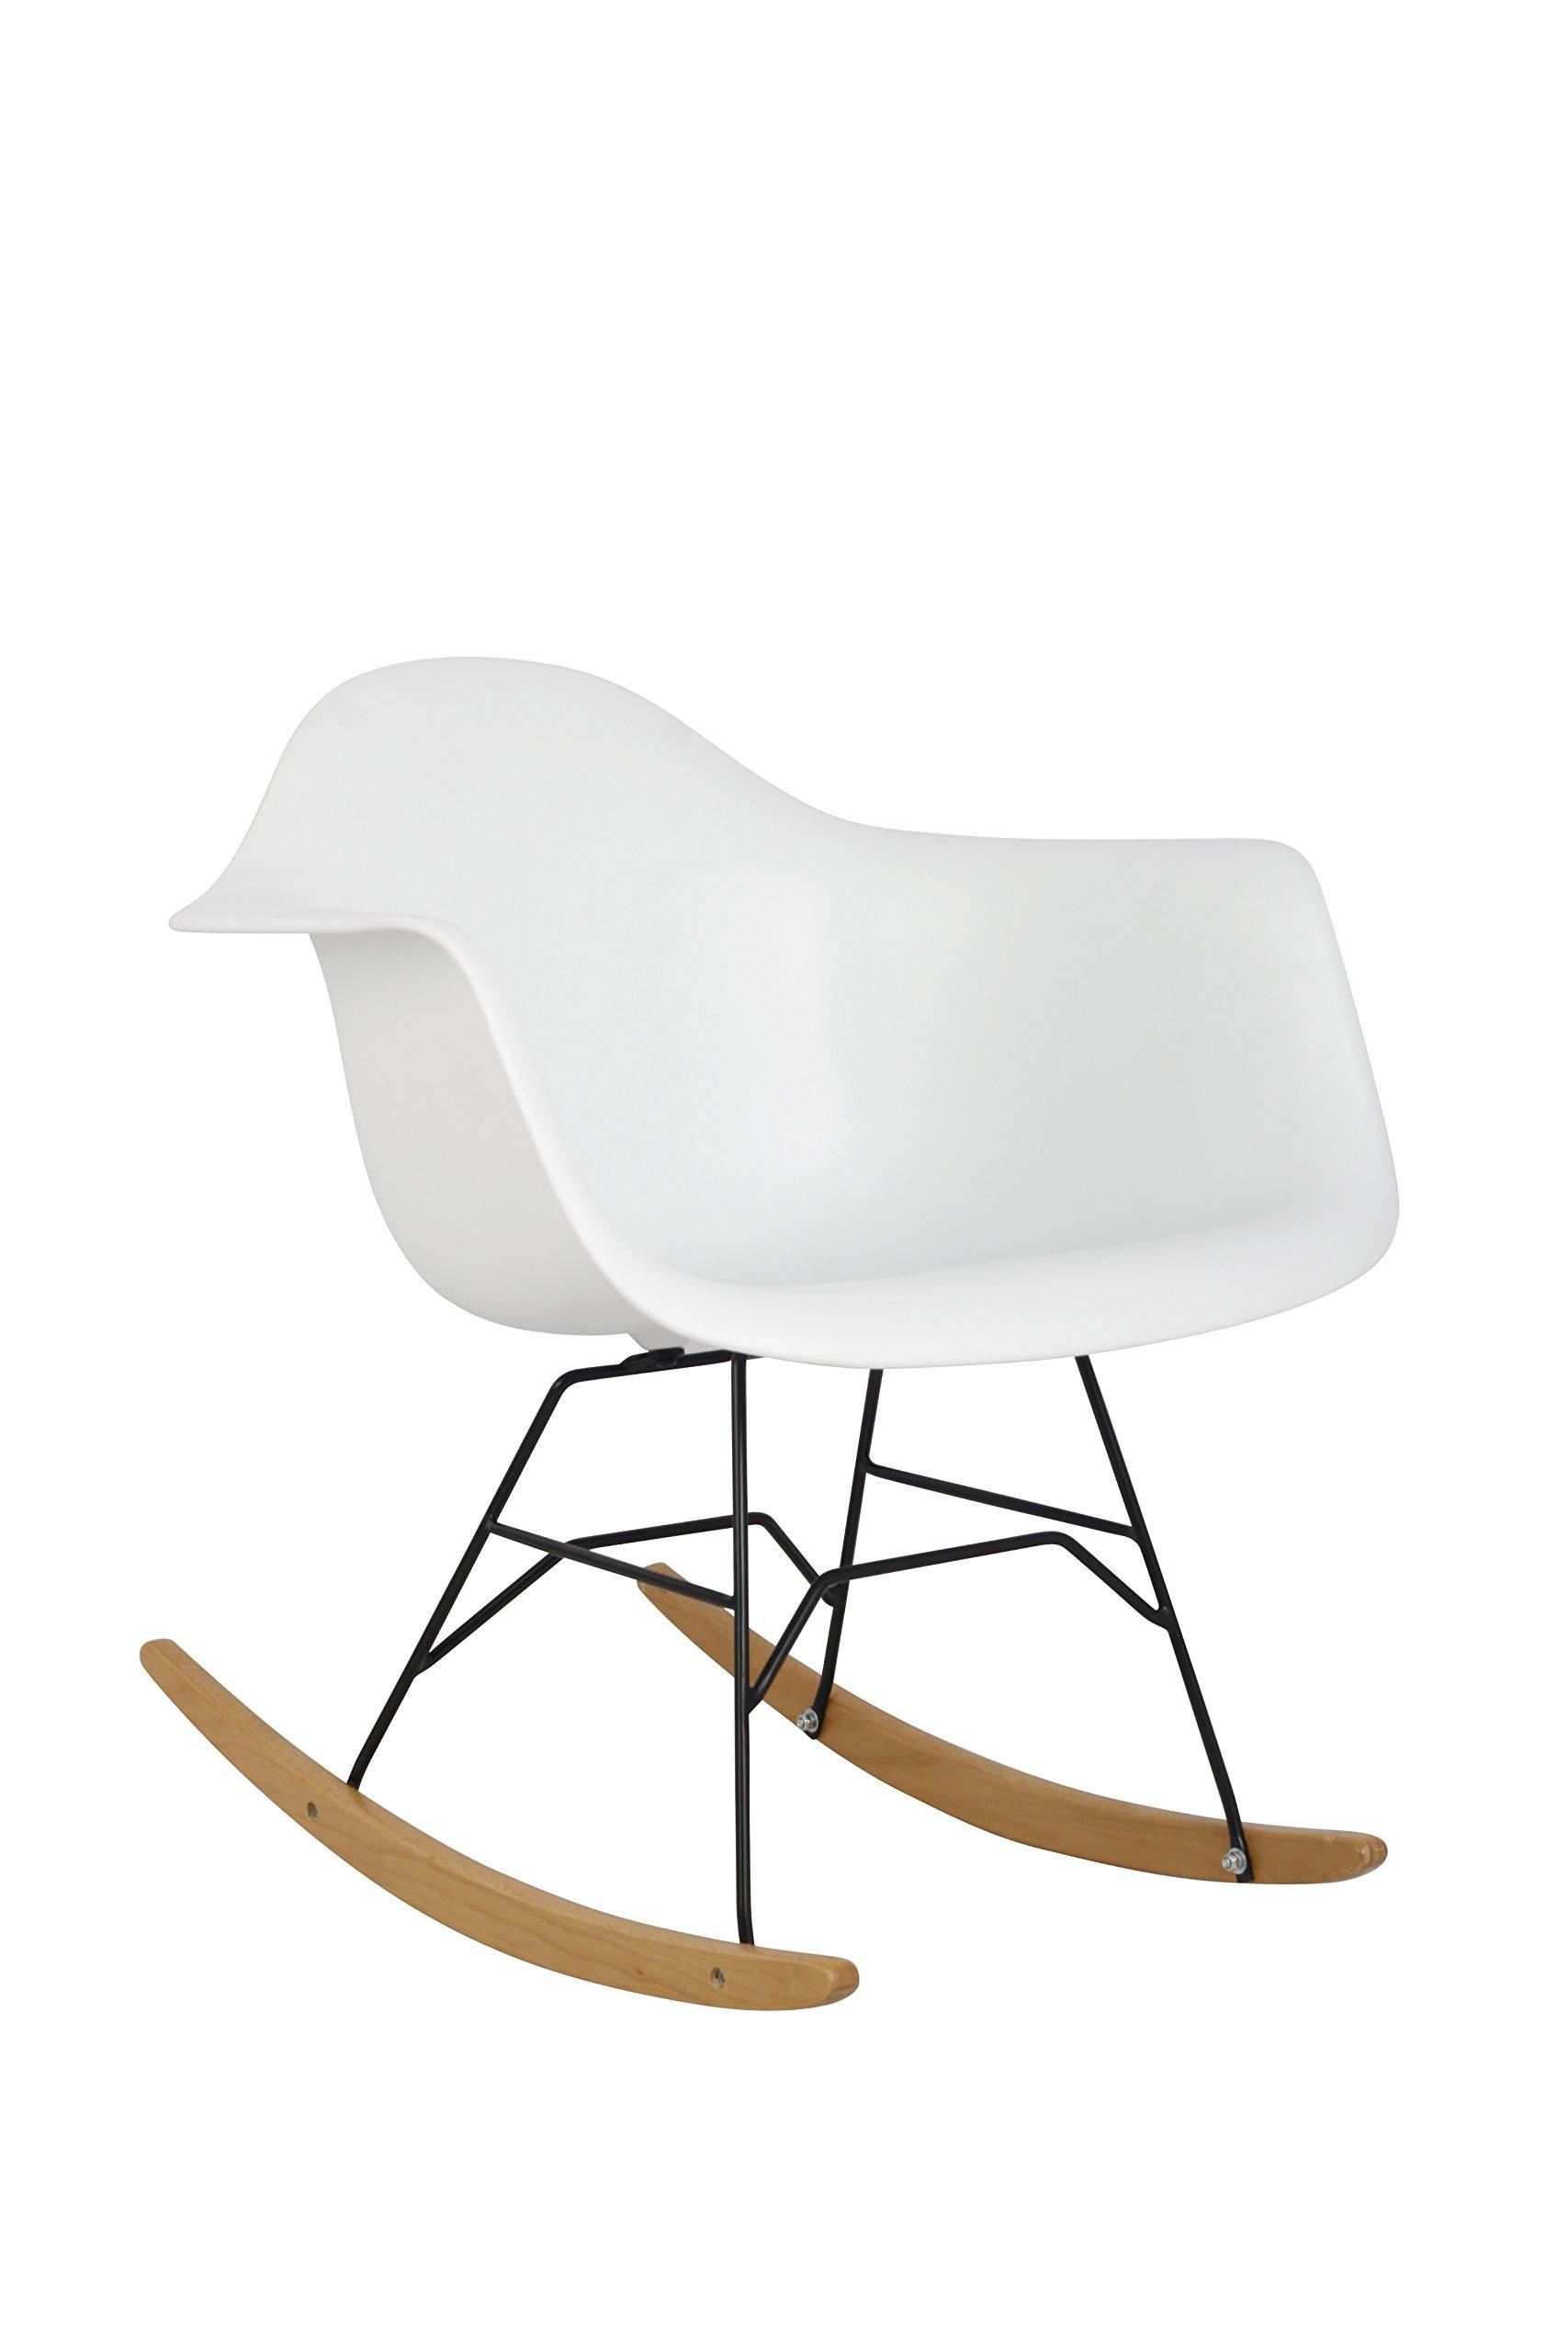 HODEDAH IMPORT Hodedah Mid Century Modern, Molded Rocking Bucket Chair, White